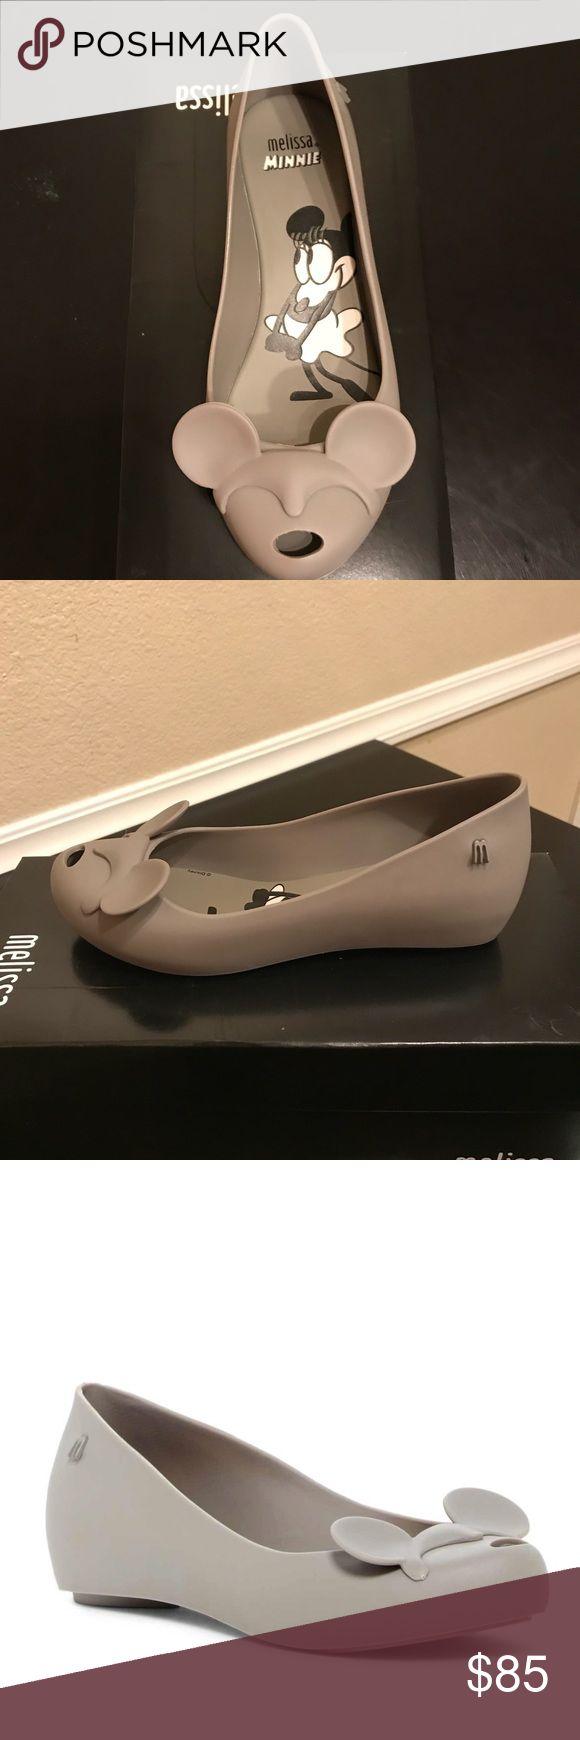 Mini Melissa Jelly peep toe flats NWB Minnie Mouse peep toe flats. Fits like a 4 in girls. Melissa Shoes Flats & Loafers